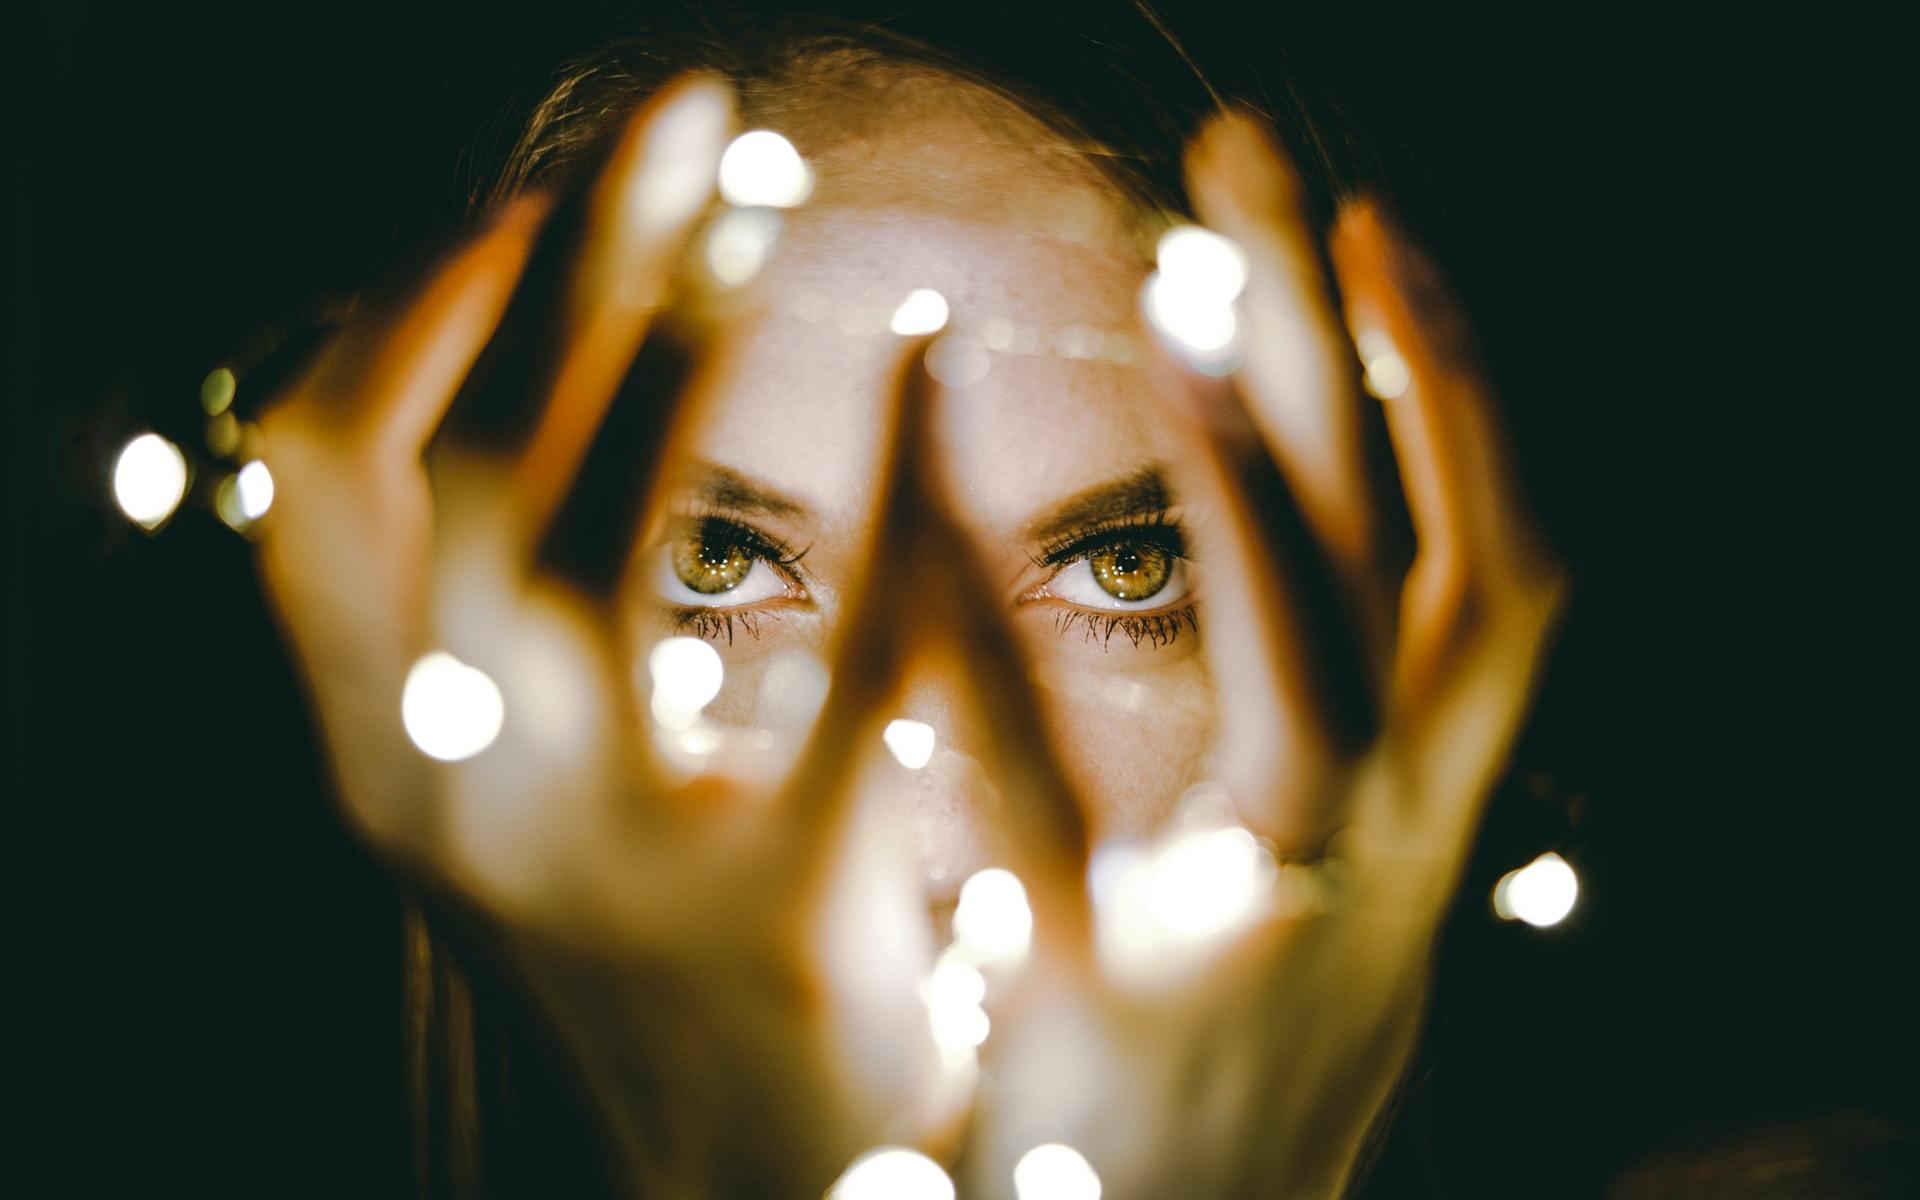 Woman holding fairy lights by Rhett Wesley on Unsplash